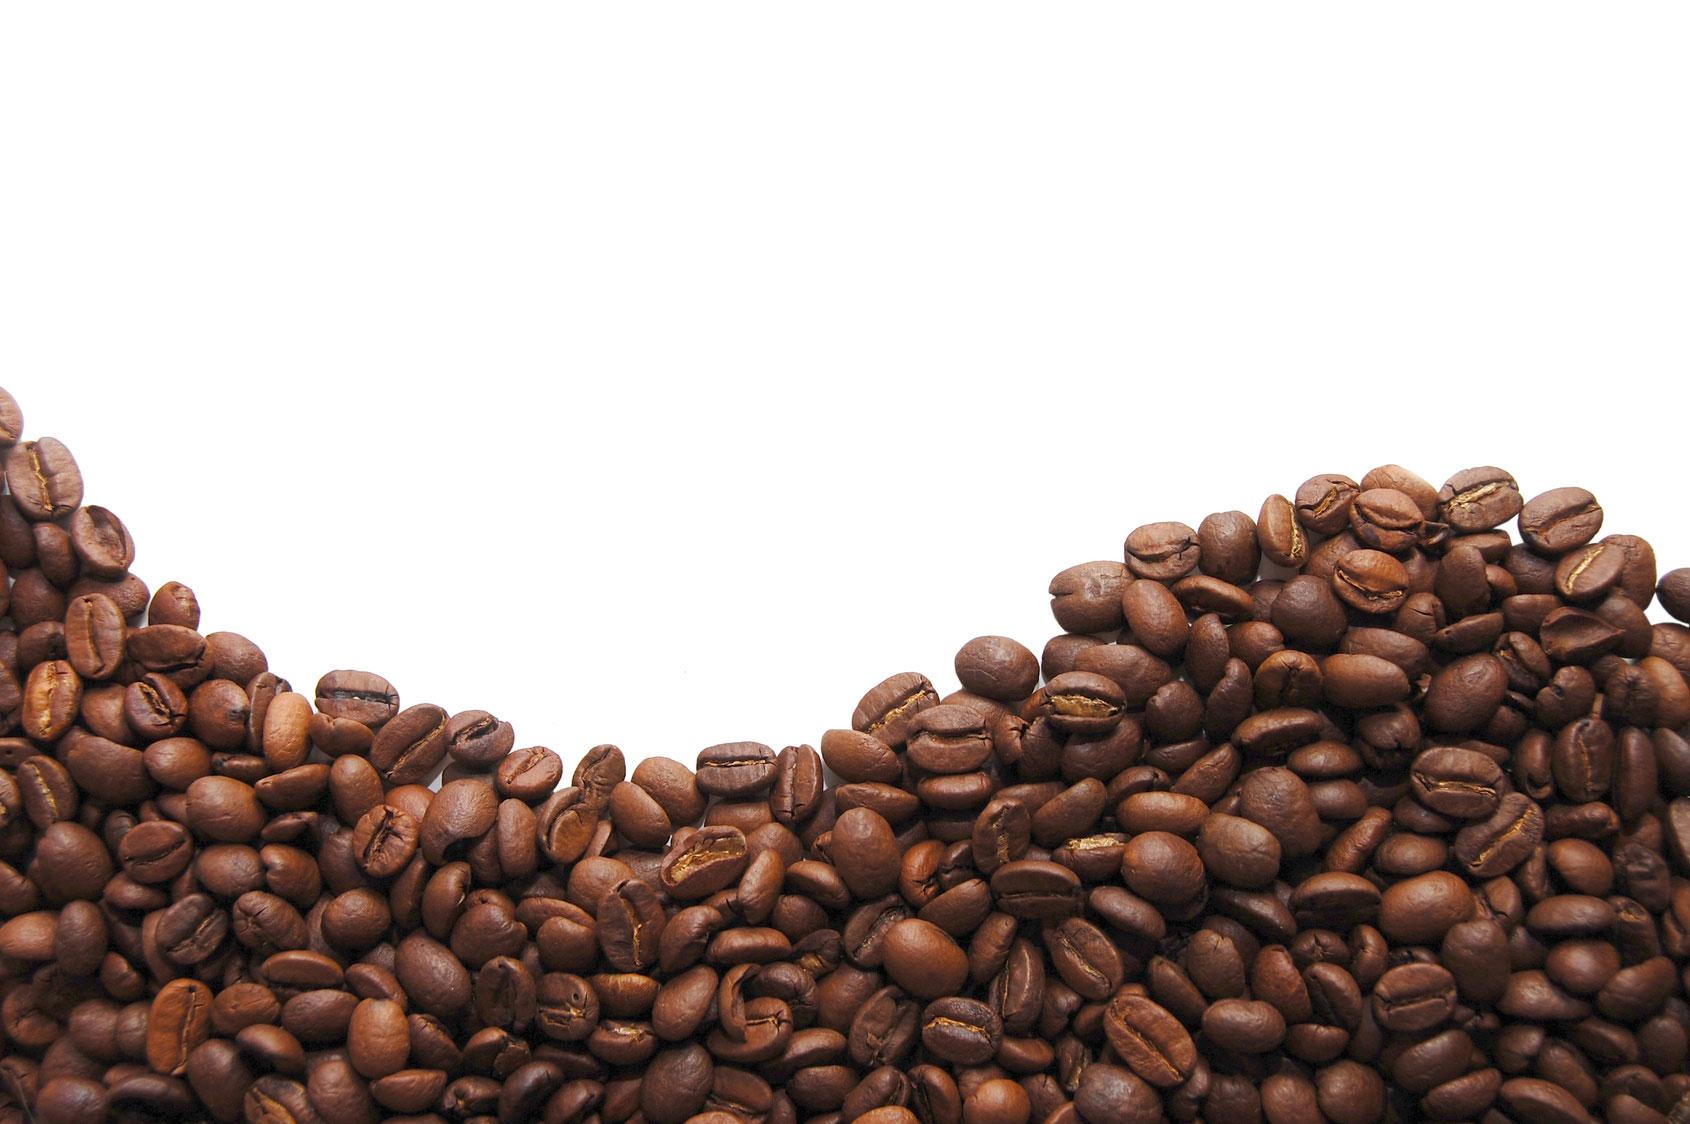 41+ Coffee Beans Background on WallpaperSafari